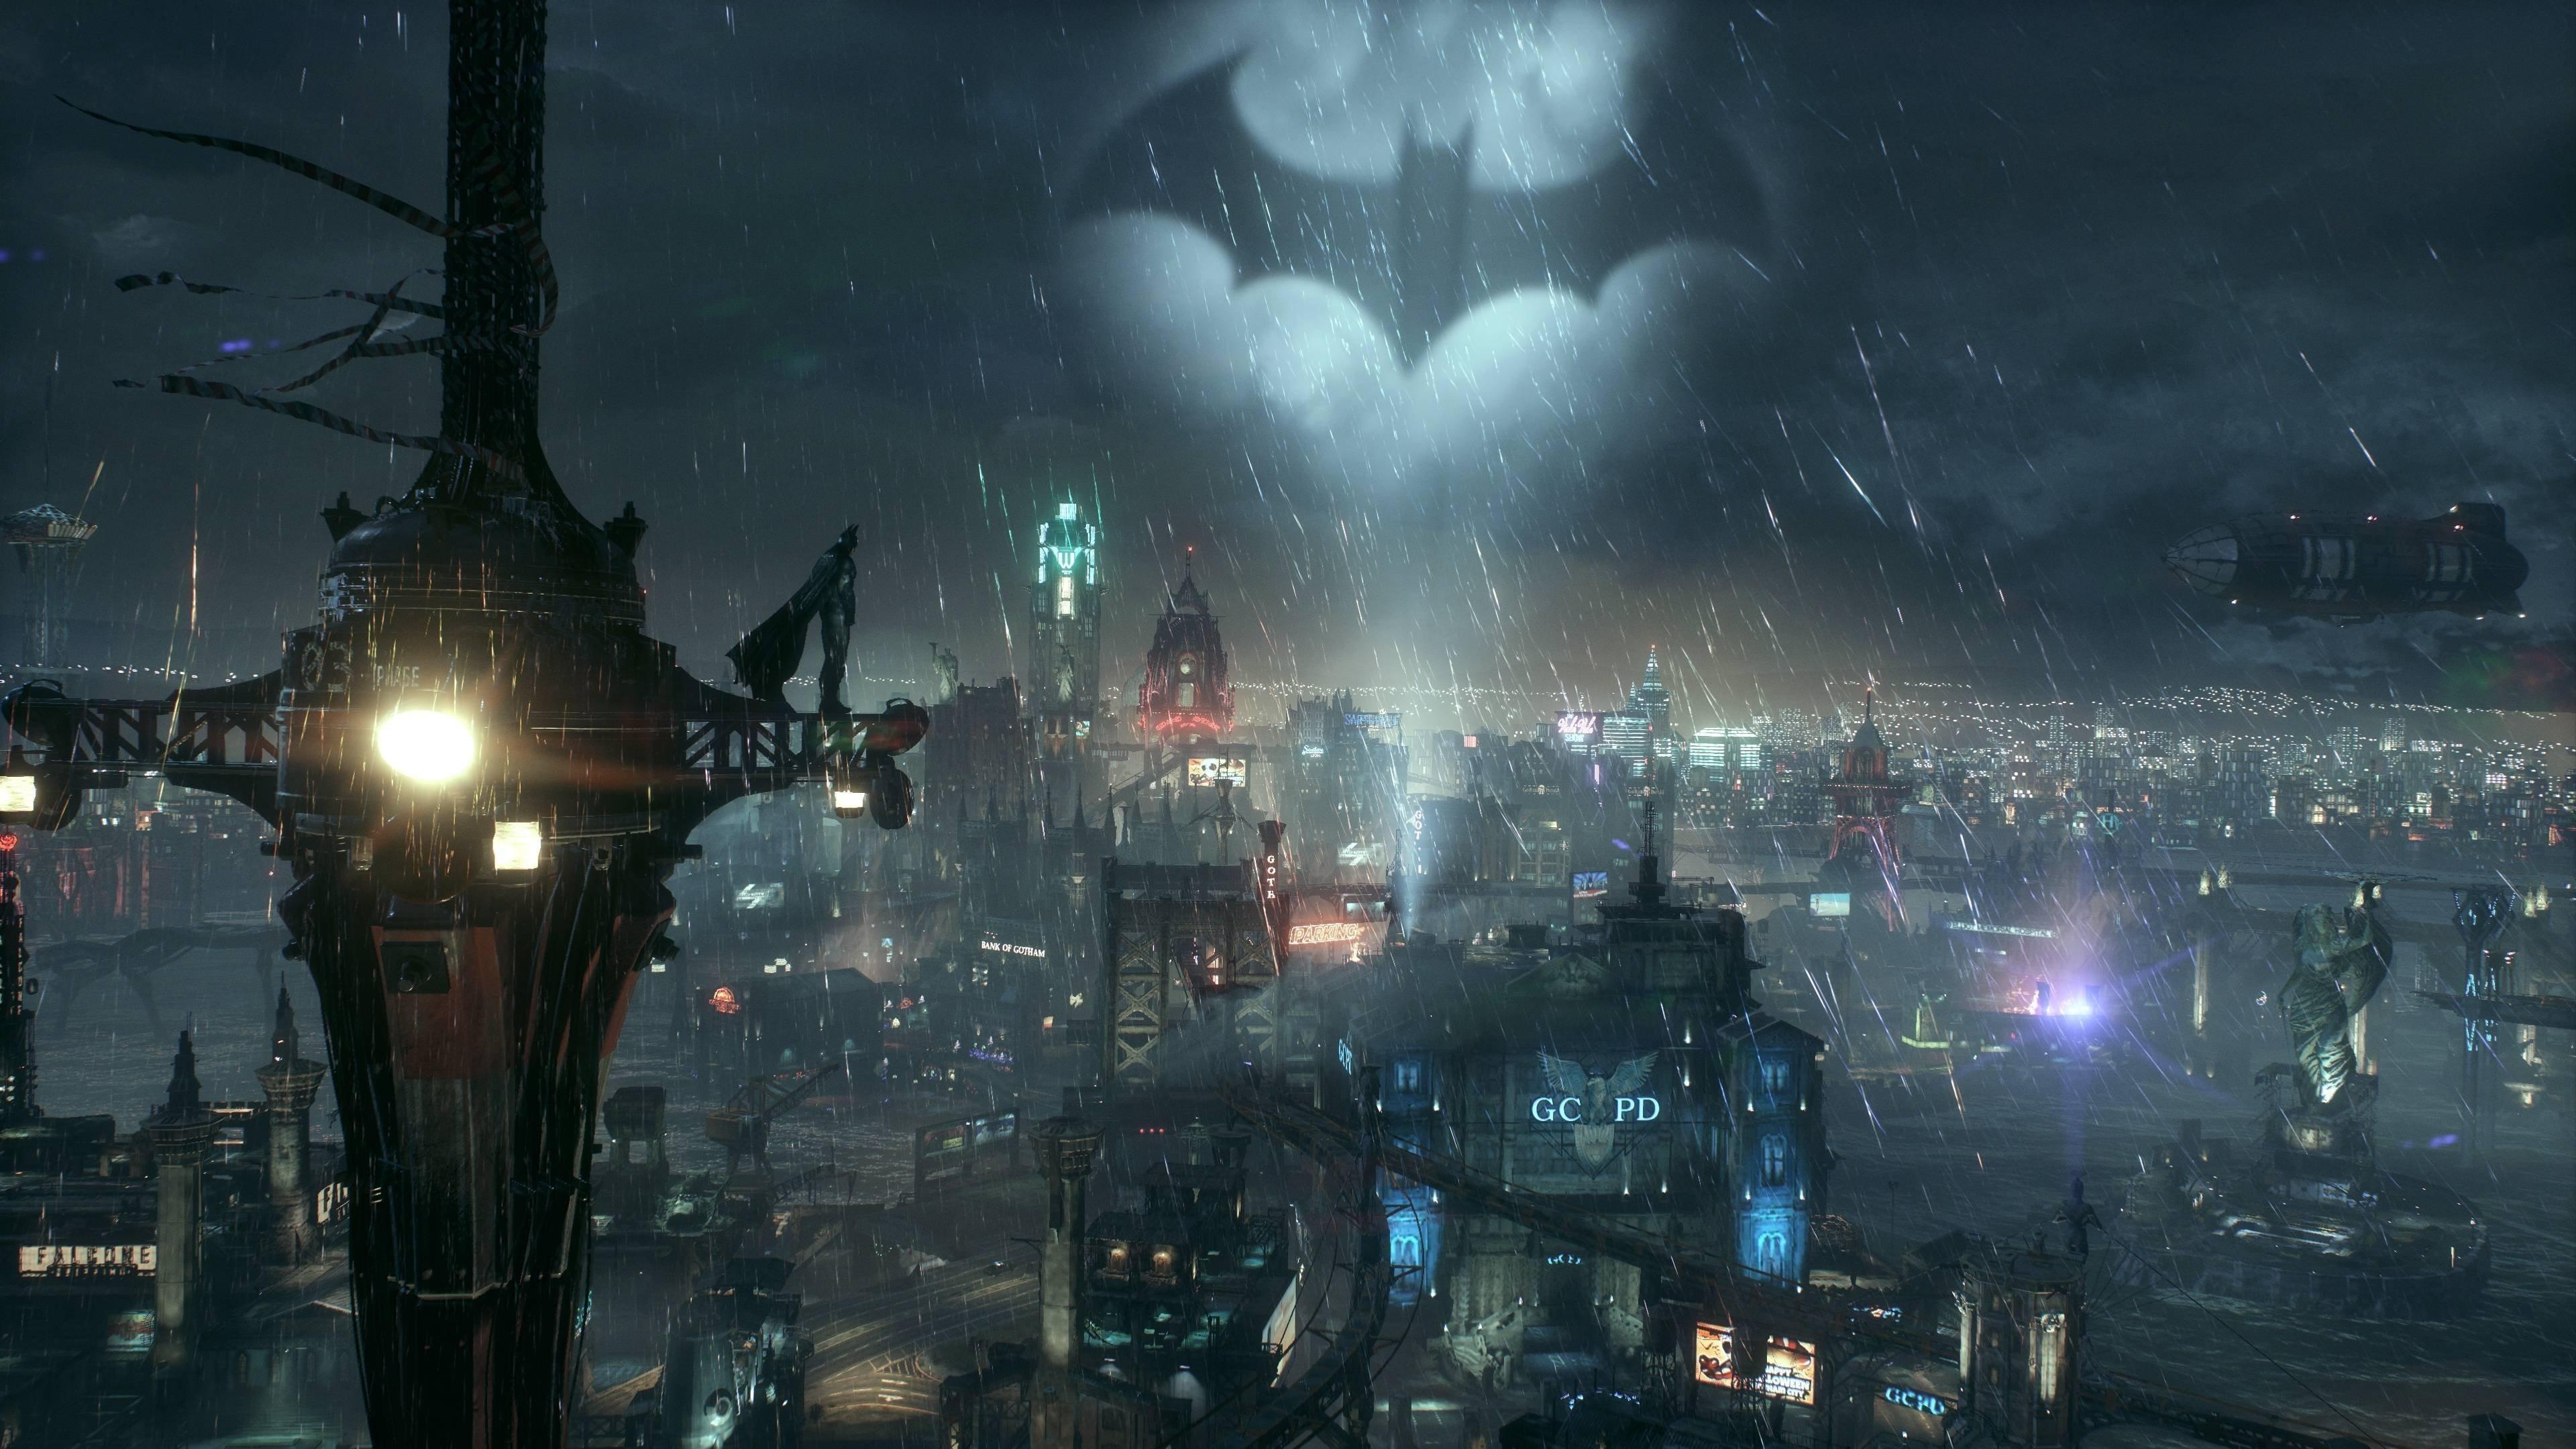 Desktop Wallpaper Bat Light Sky Night Batman 4k Hd Image Picture Background 85b712